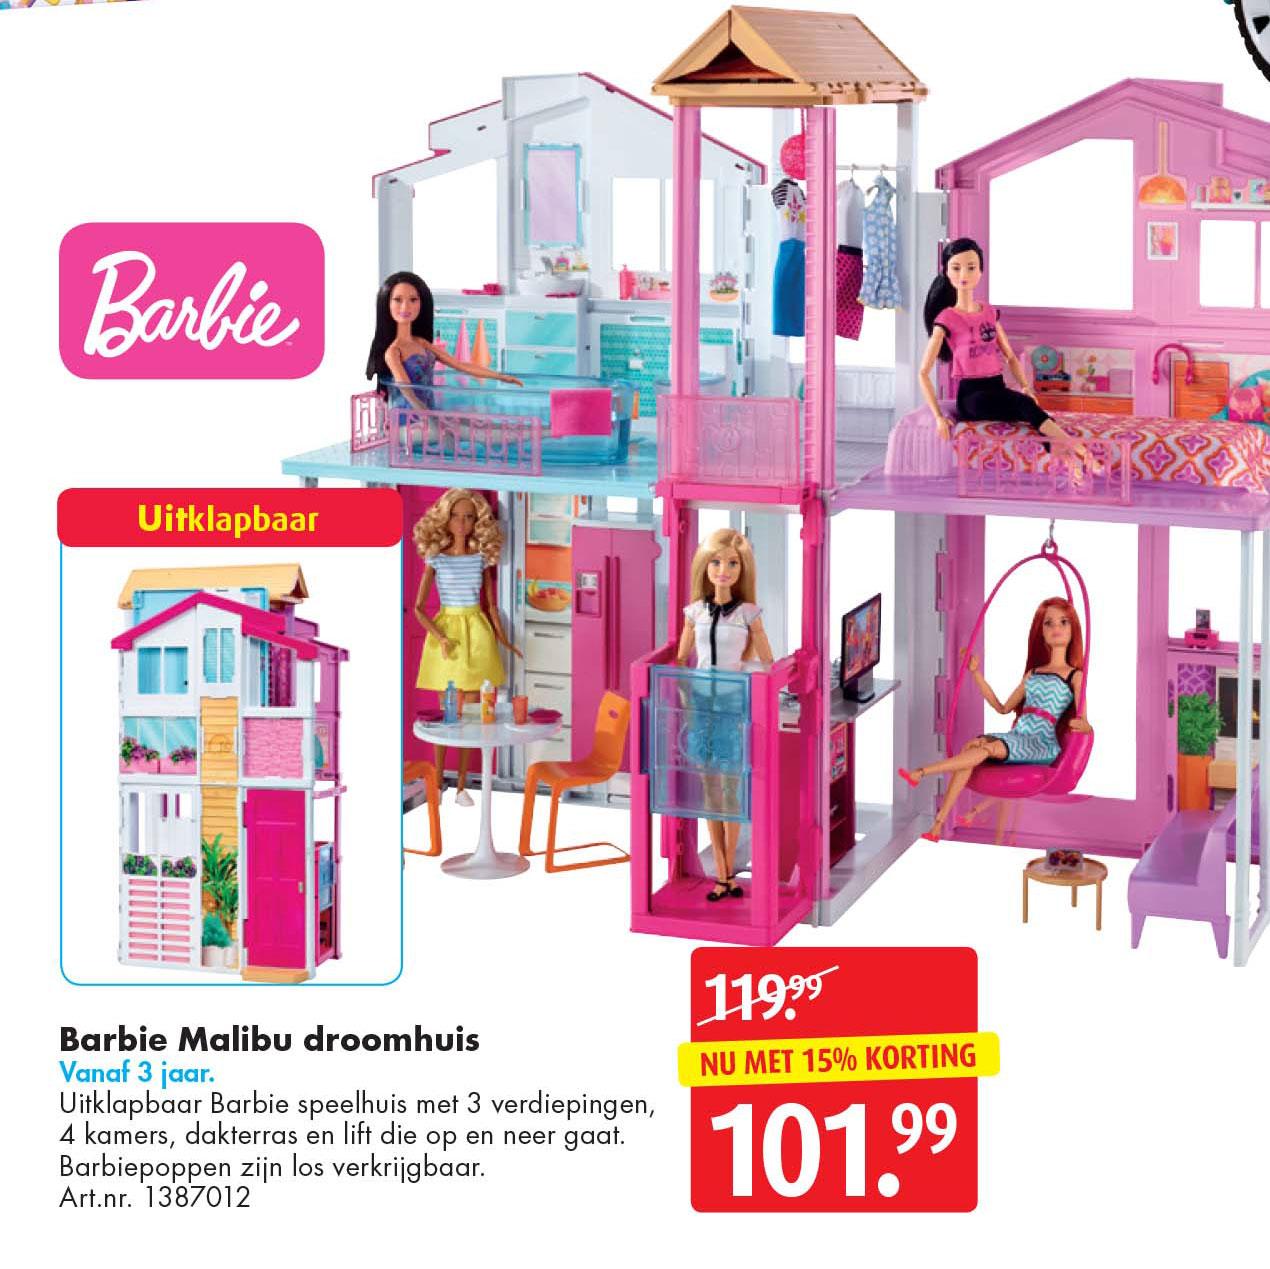 Bart Smit Barbie Malibu Droomhuis